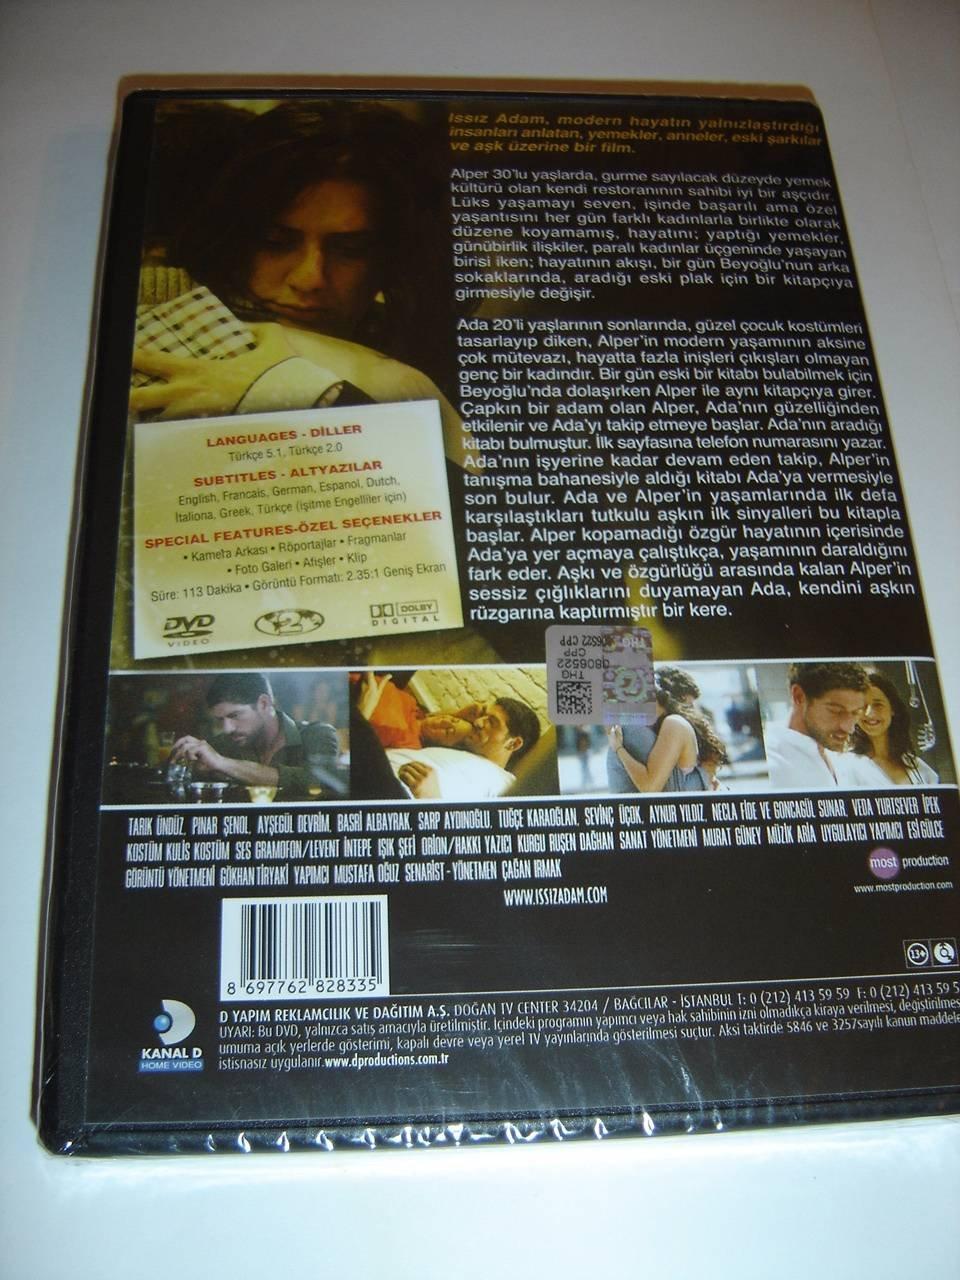 Amazon.com: Issiz Adam (2008) Alone / ONLY TURKISH Audio / English, French, German, Spanish, Dutch, Italian, Greek and Turkish Subtitles [DVD Region 2 PAL]: ...